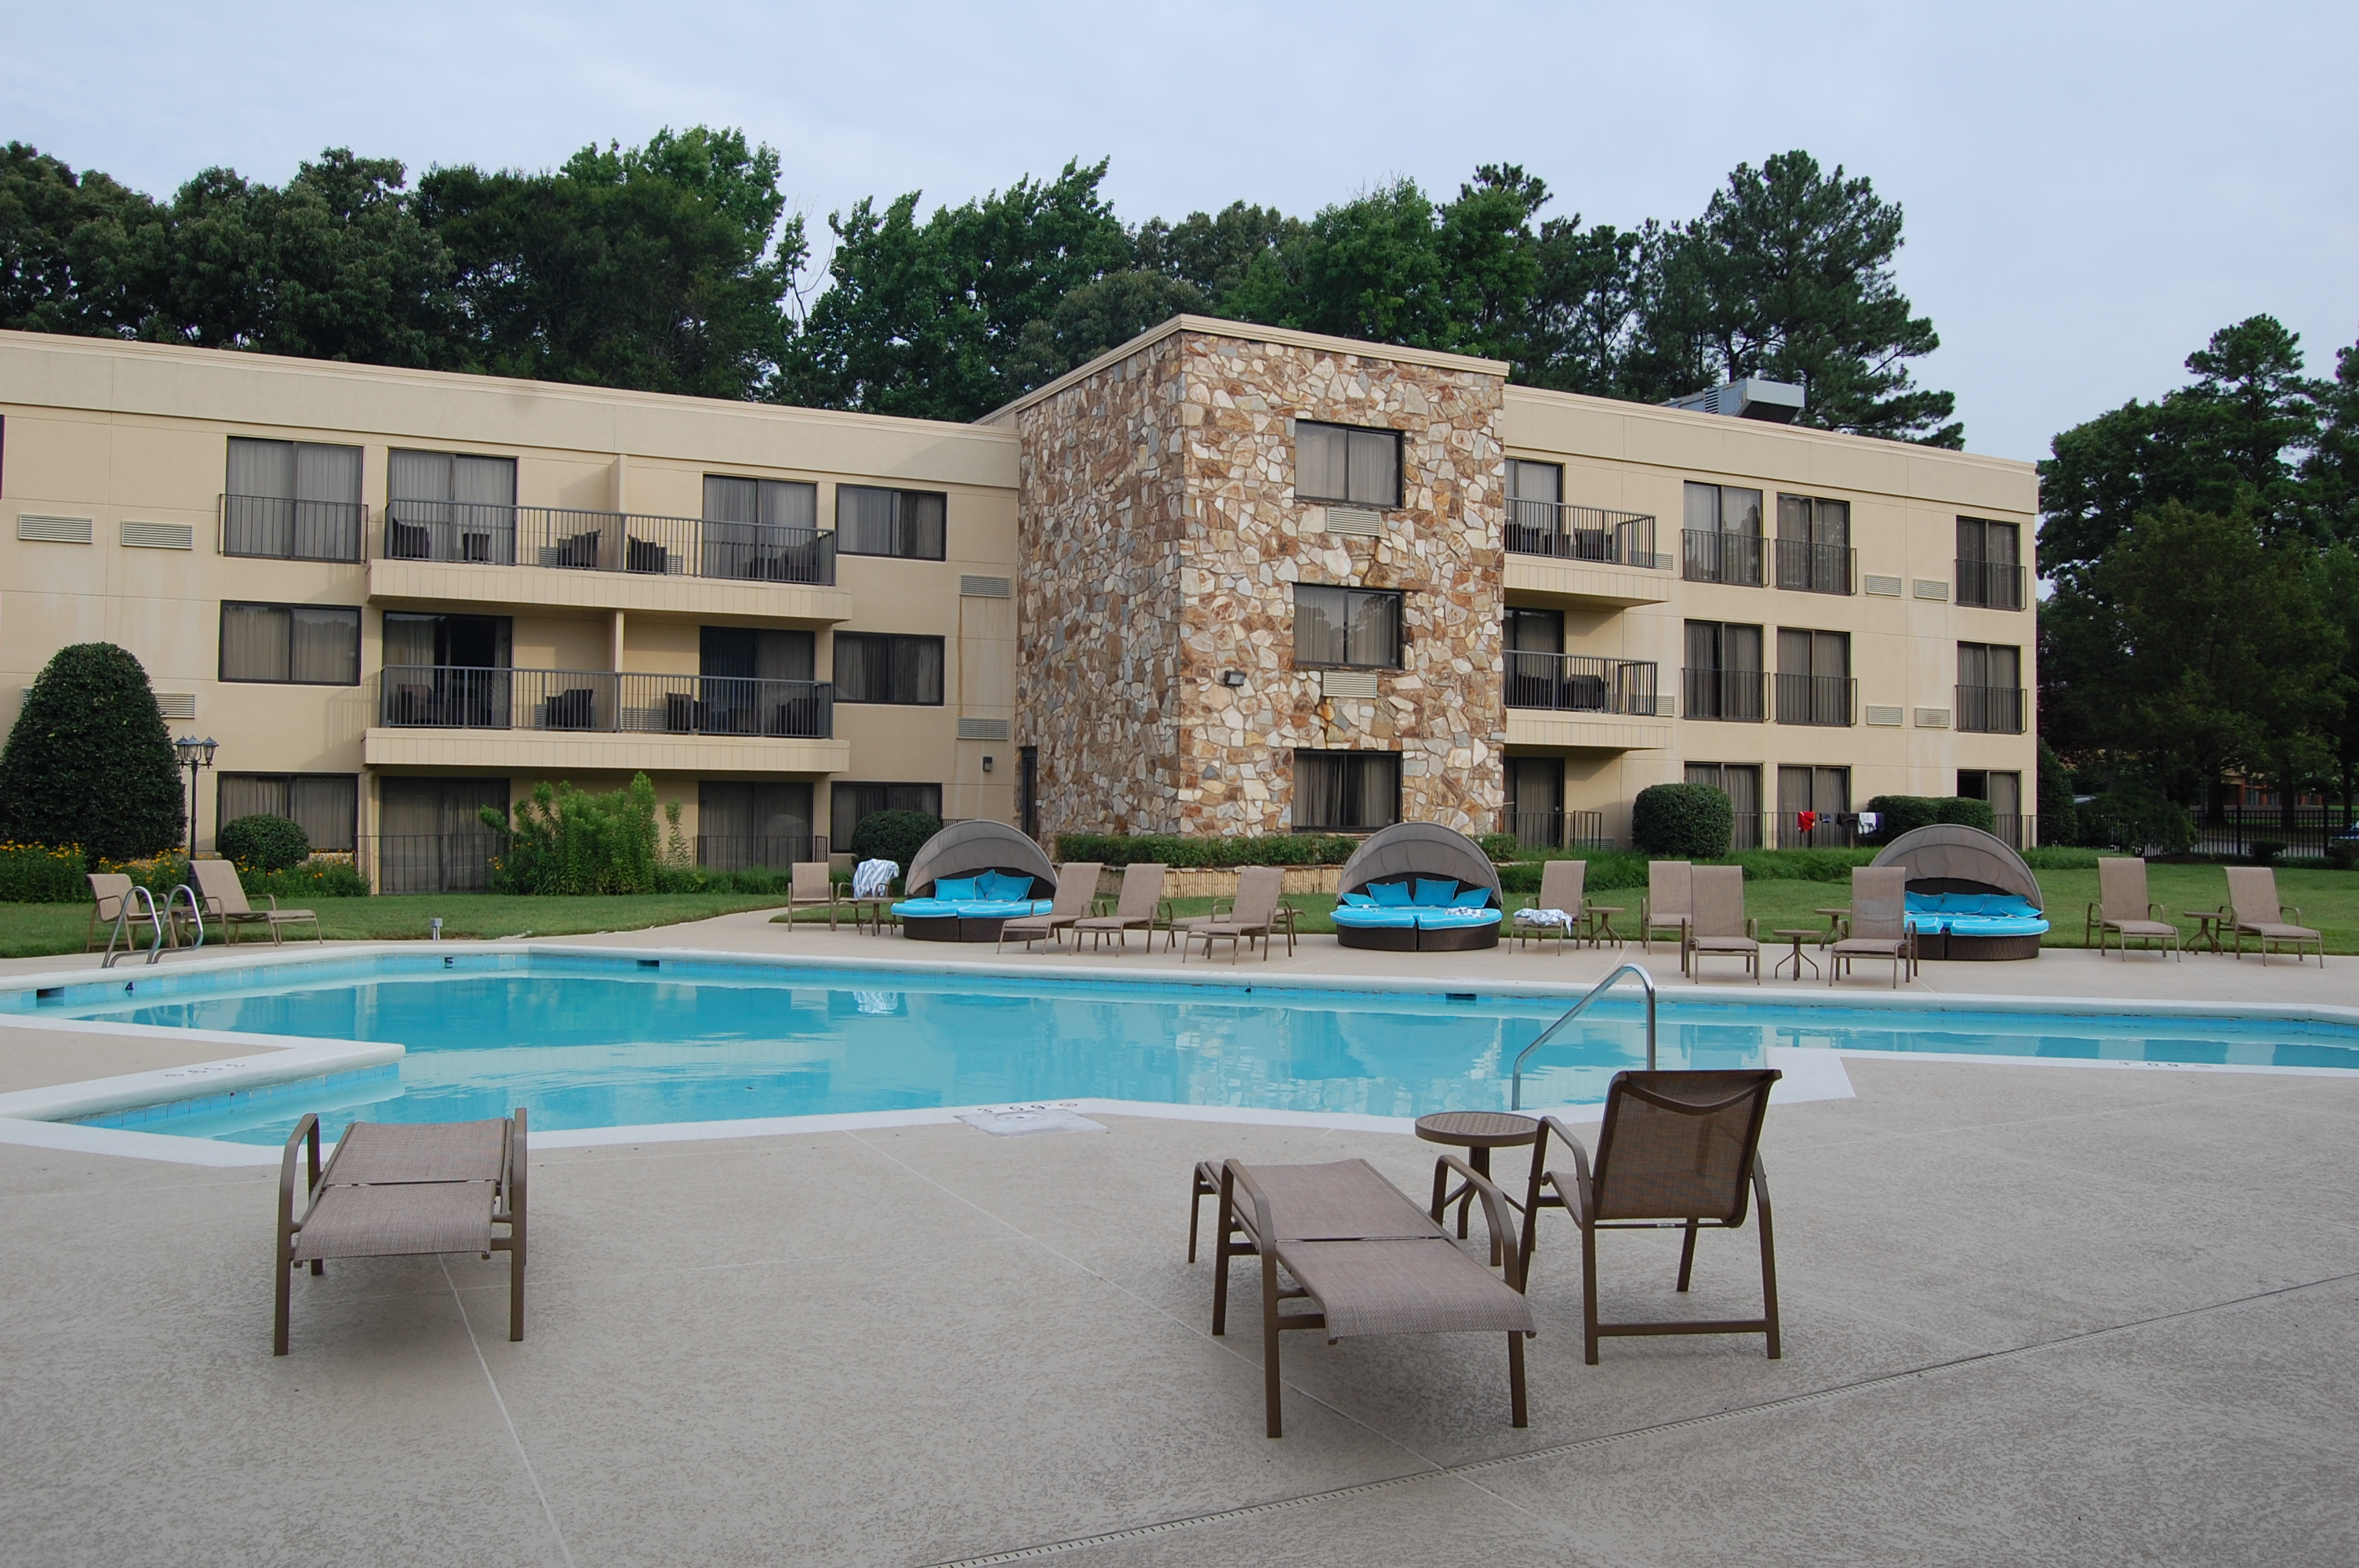 5 Star Hotels Near Busch Gardens Williamsburg Garden Ftempo